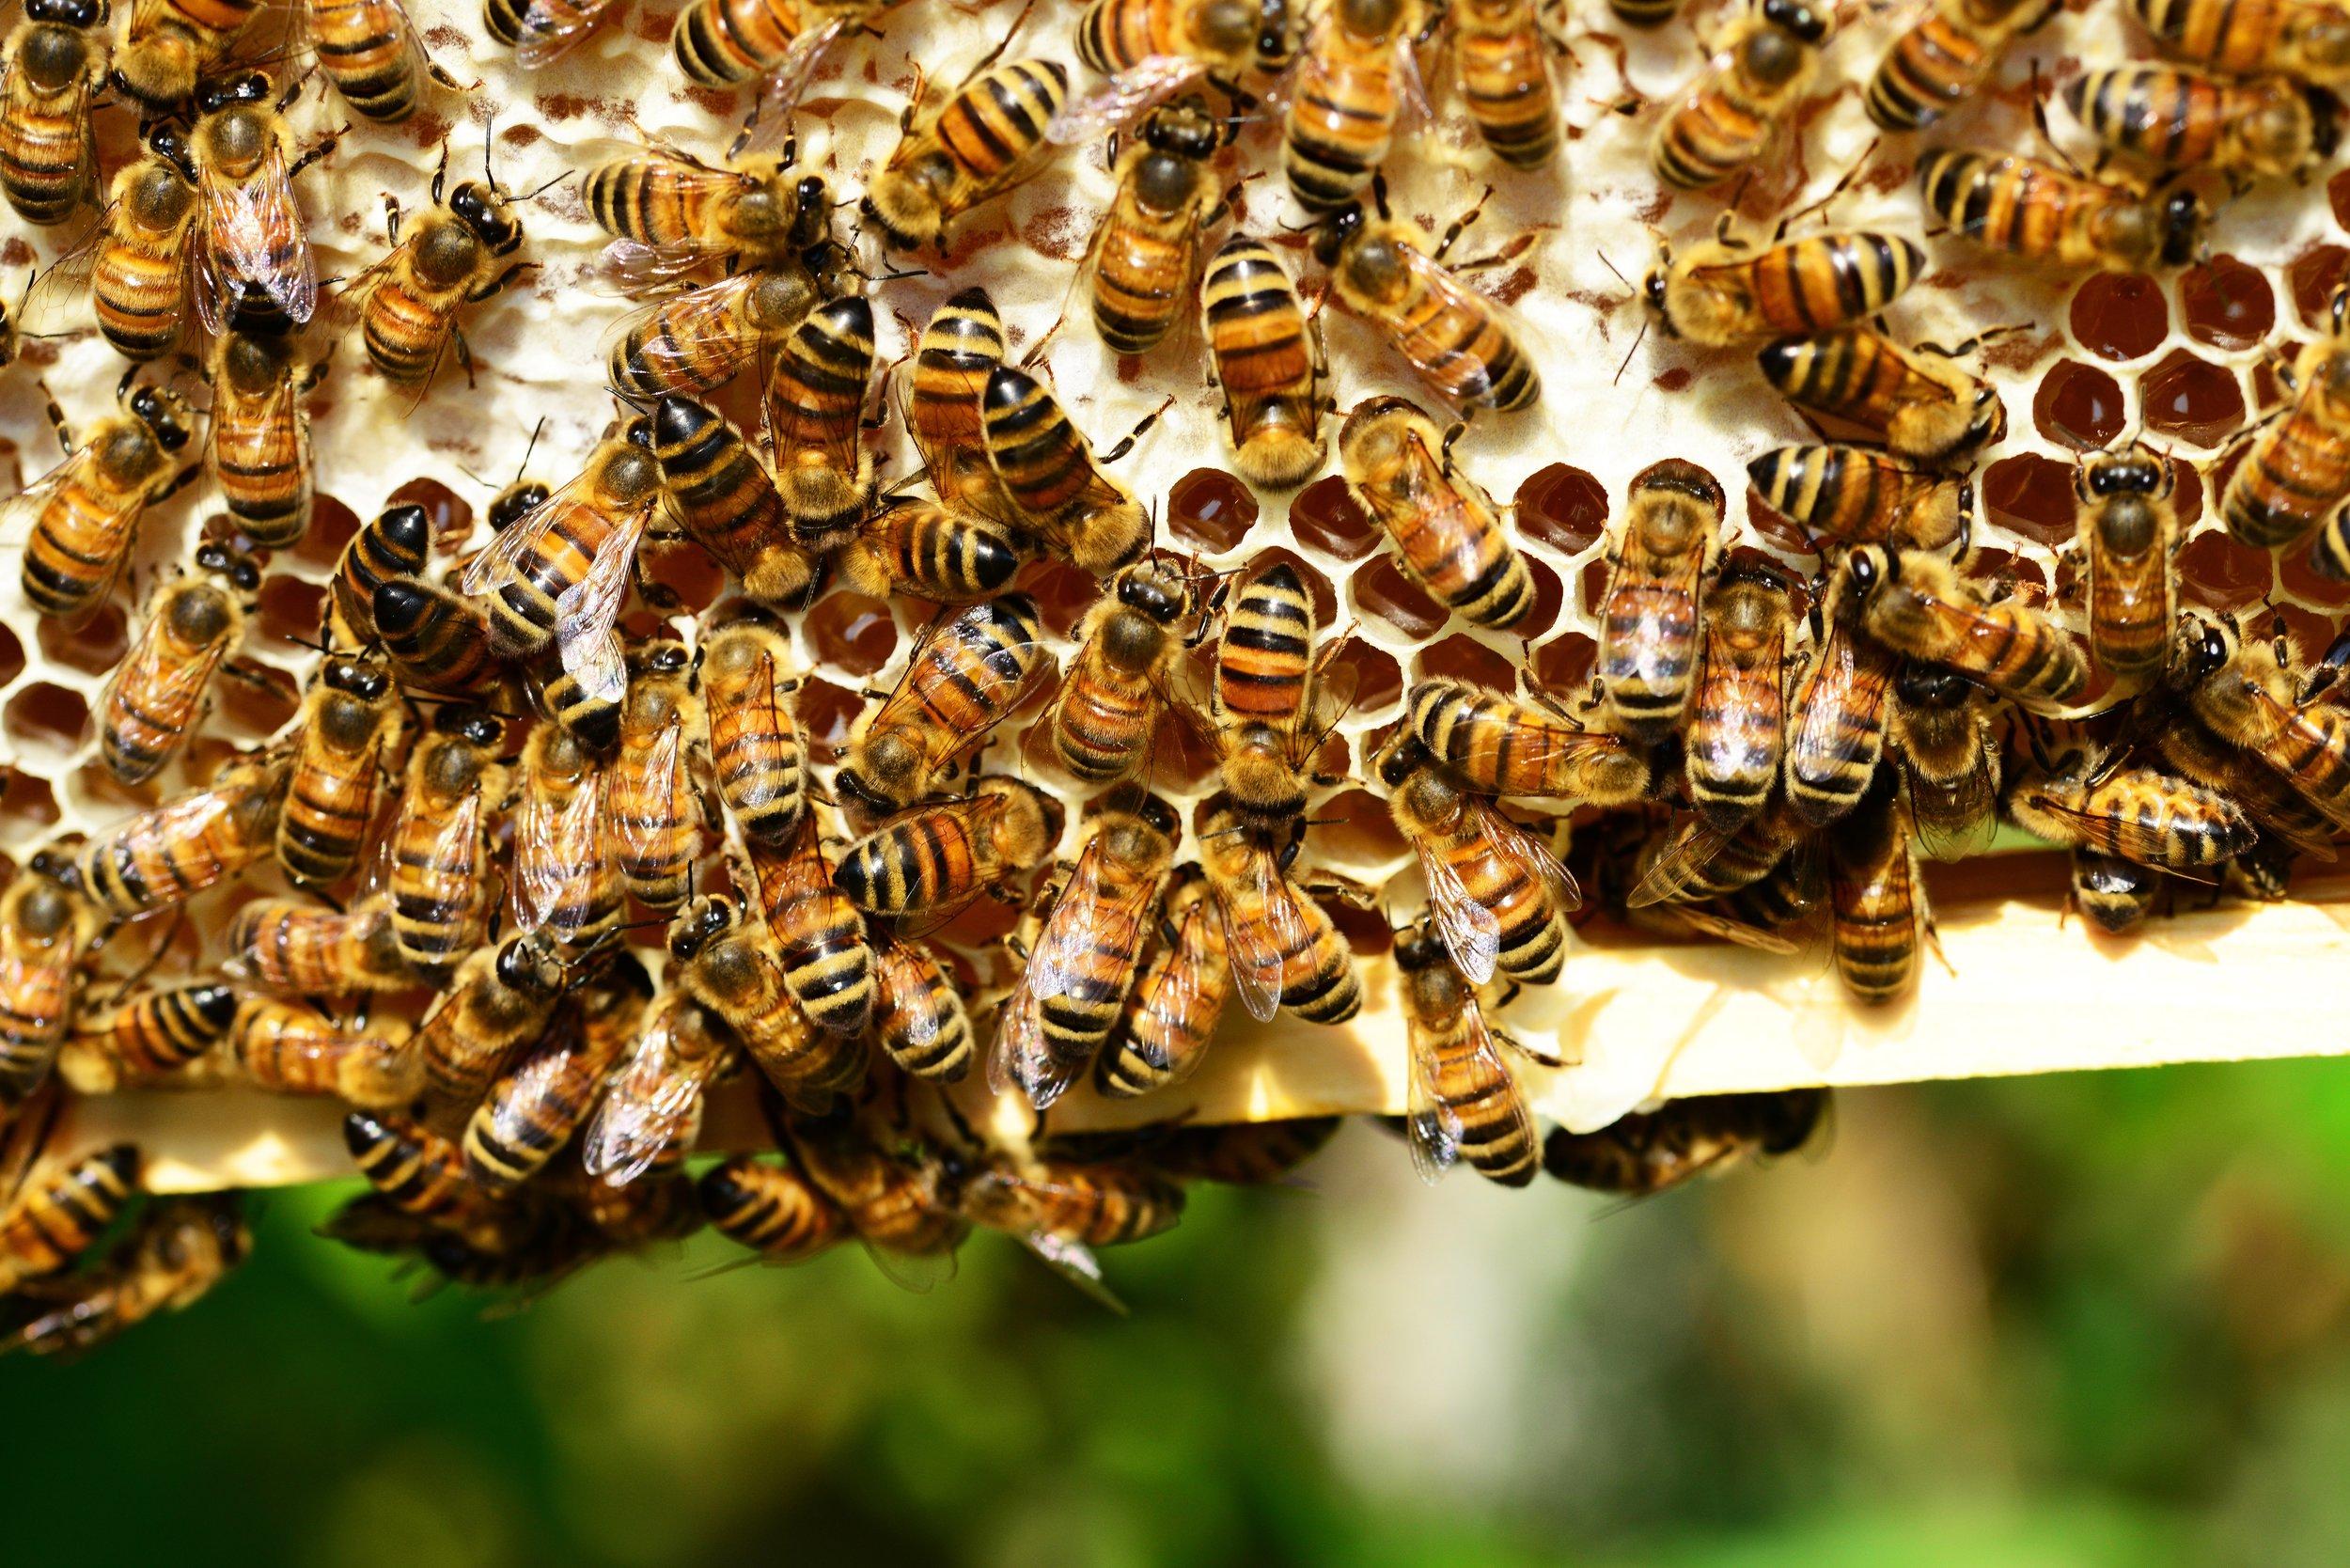 bees-close-up-honey-53444.jpg